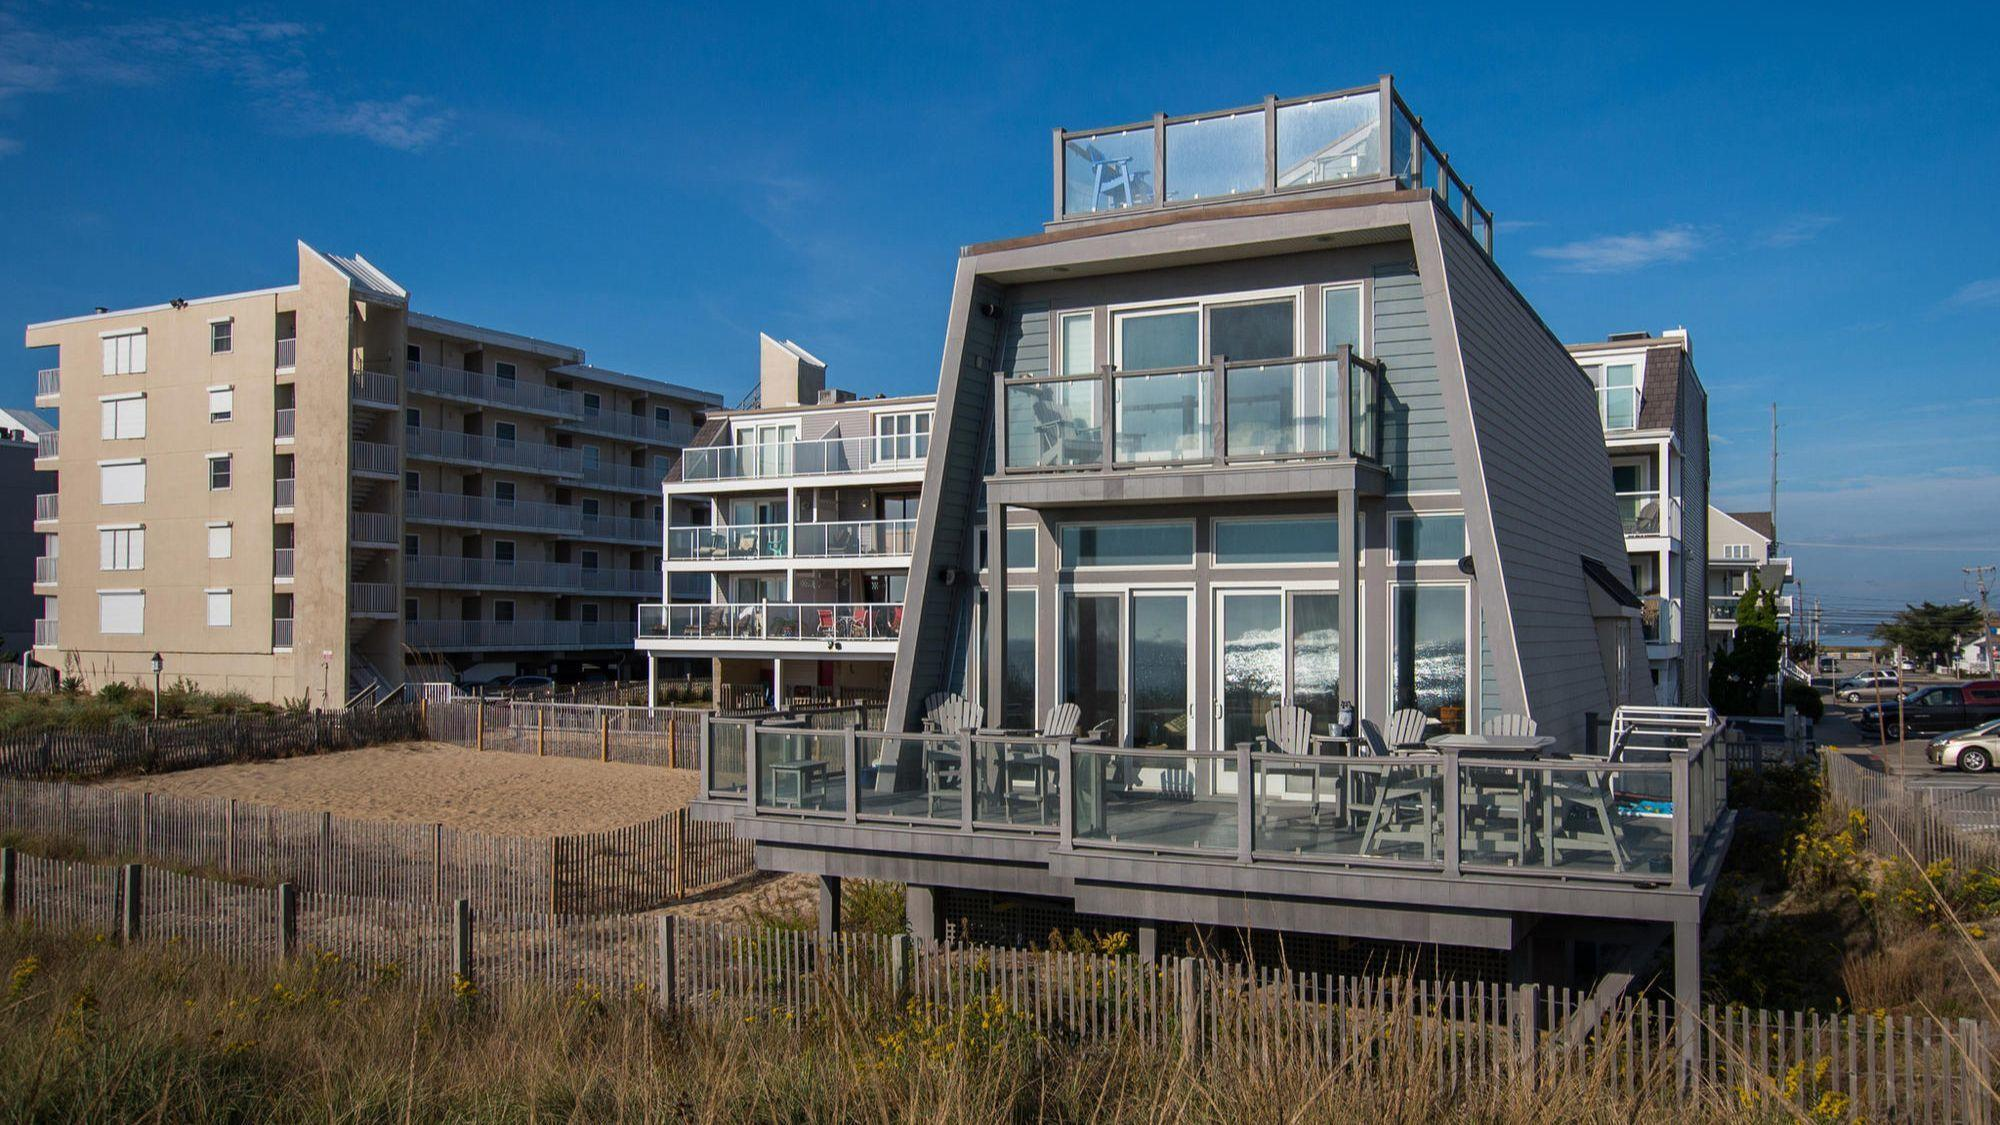 High End Rental Homes In Ocean City Rehoboth Beach Offer Luxury On